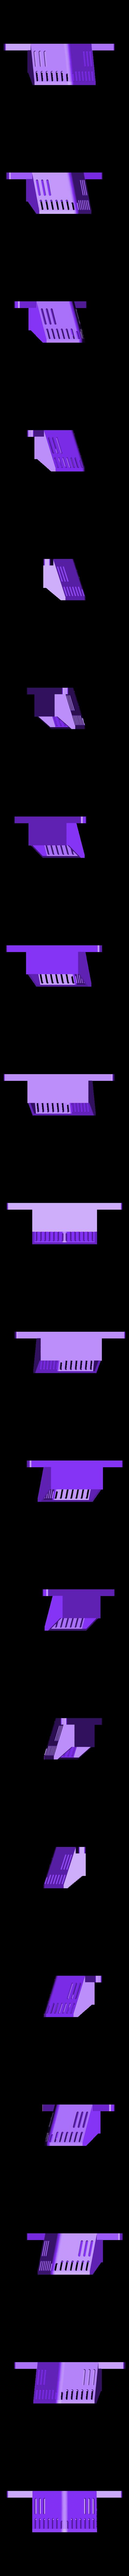 Pilot.STL Download free STL file 4-8-8-4 Big Boy Locomotive • 3D printer object, RaymondDeLuca